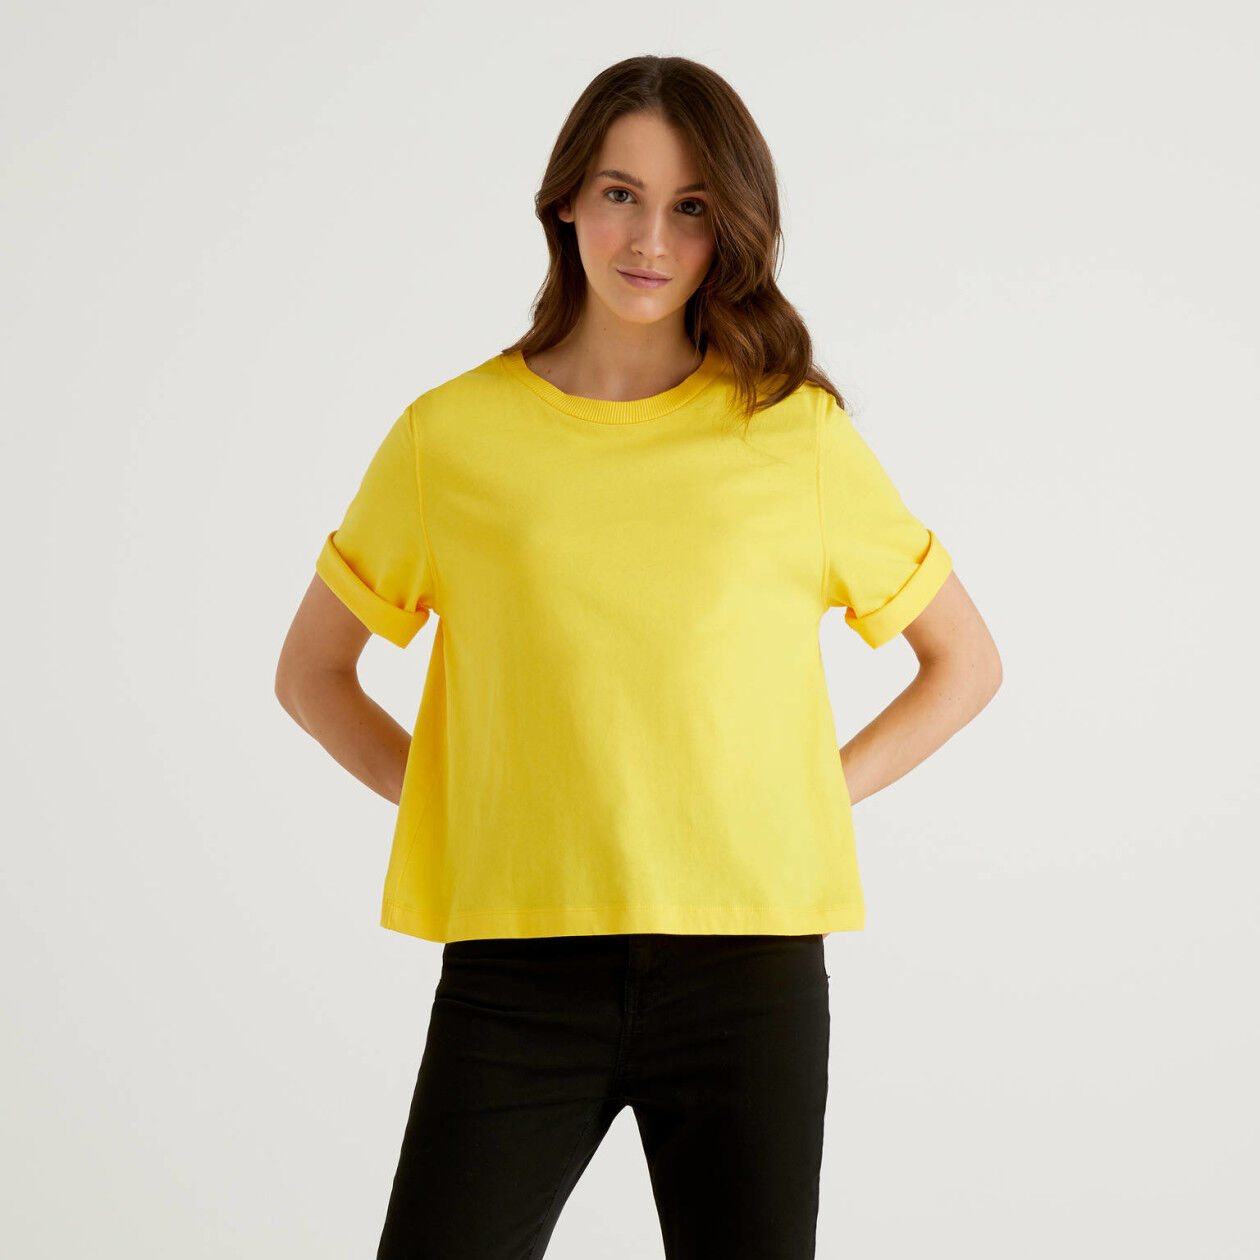 Camiseta corta de cuello redondo